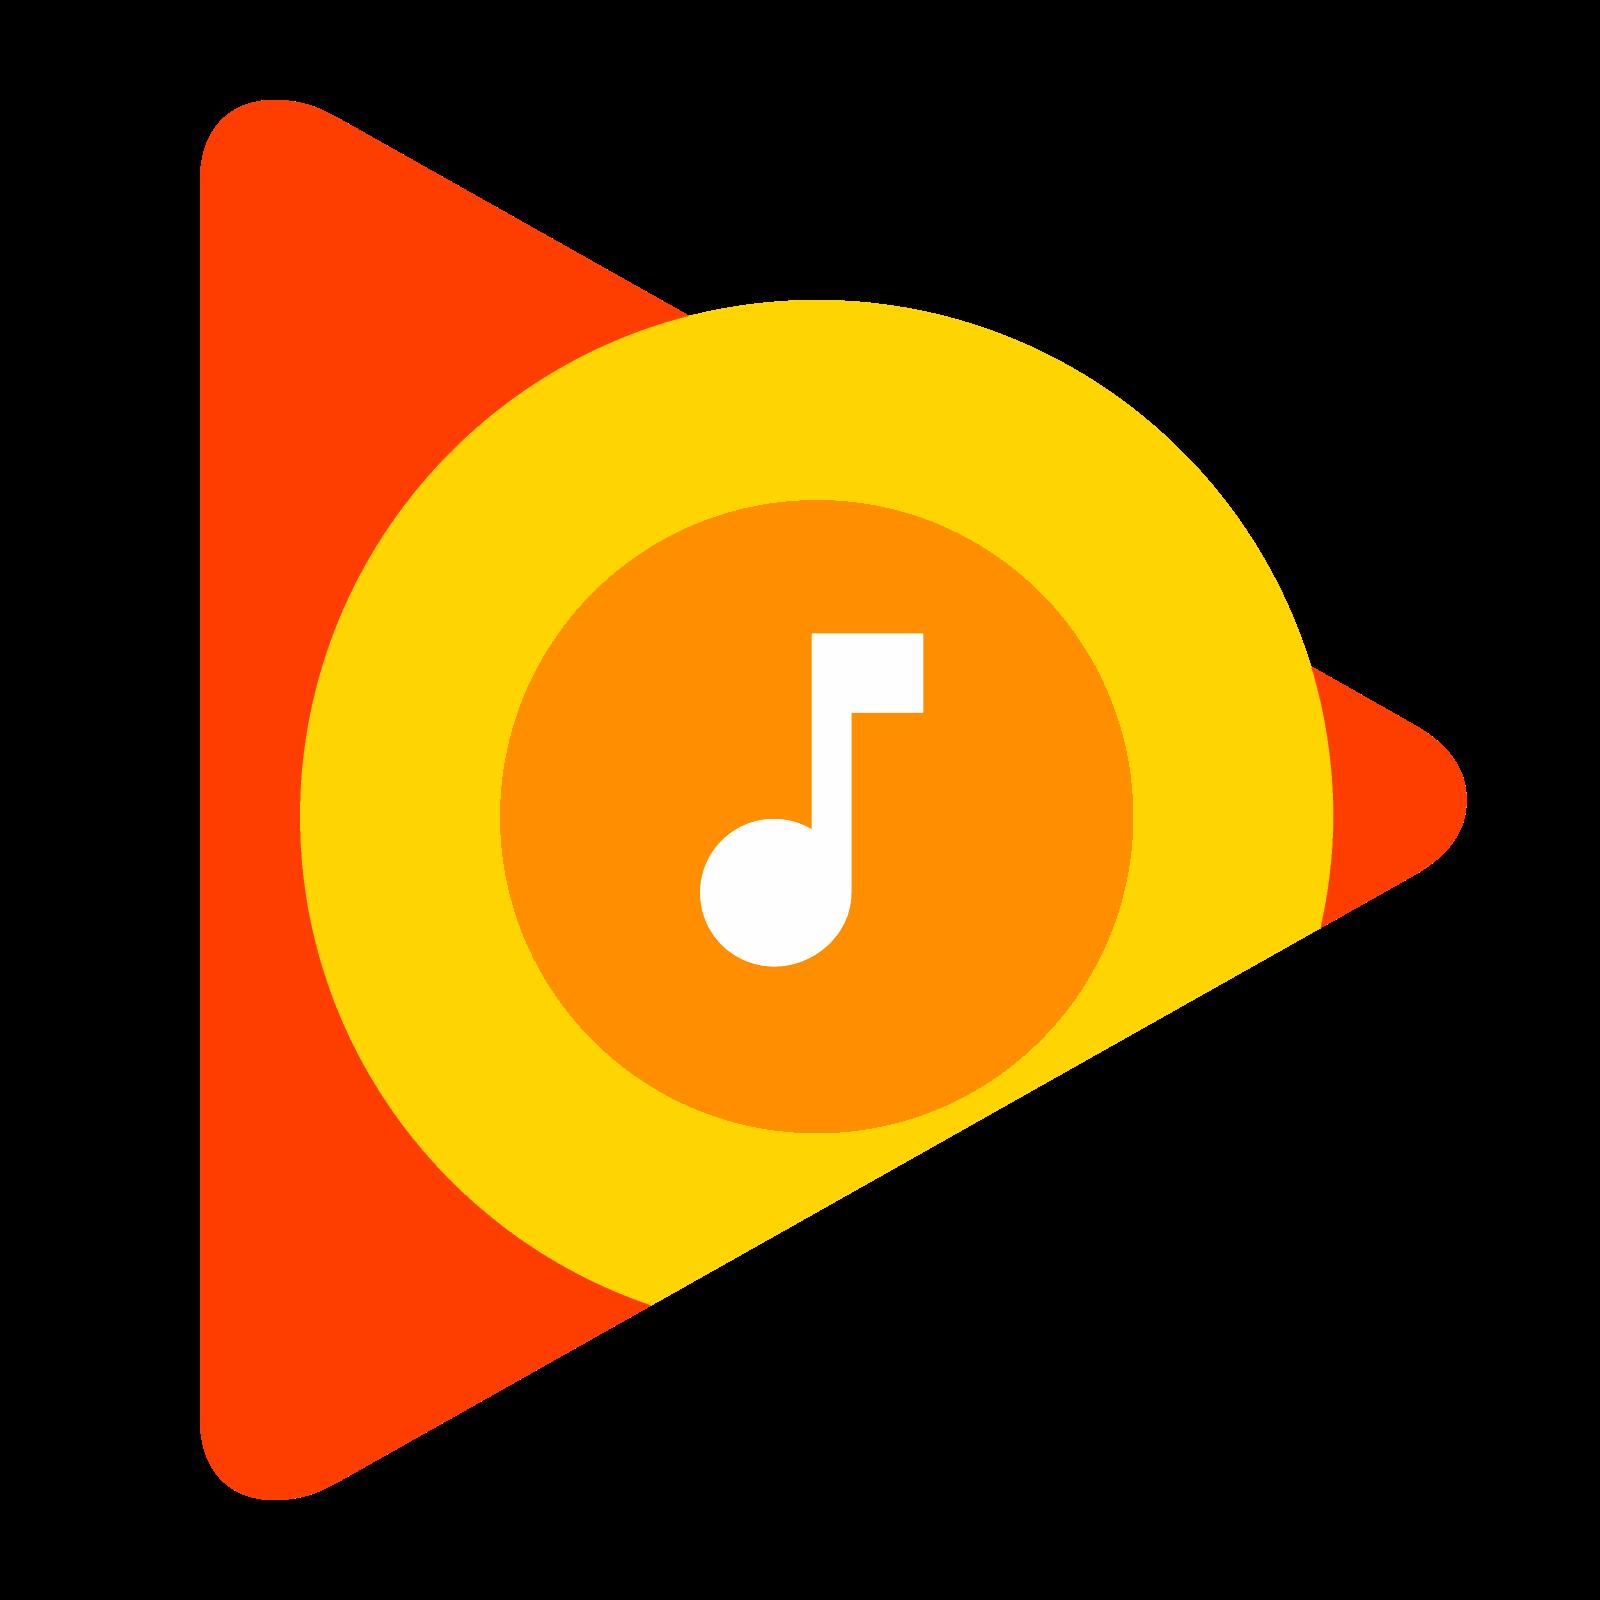 Google play music png, Google play music png Transparent.